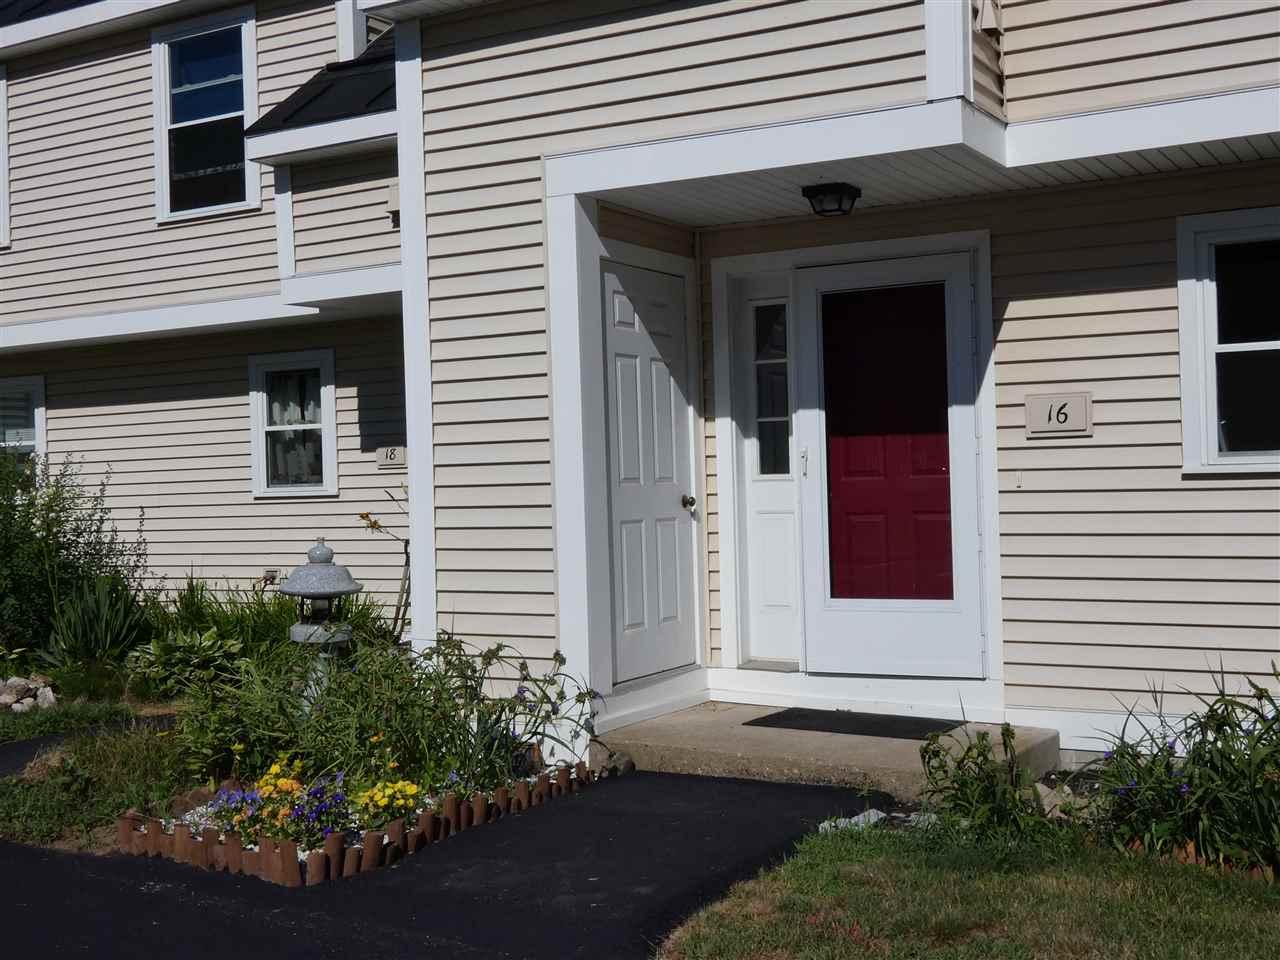 image of Concord NH Condo | sq.ft. 1142